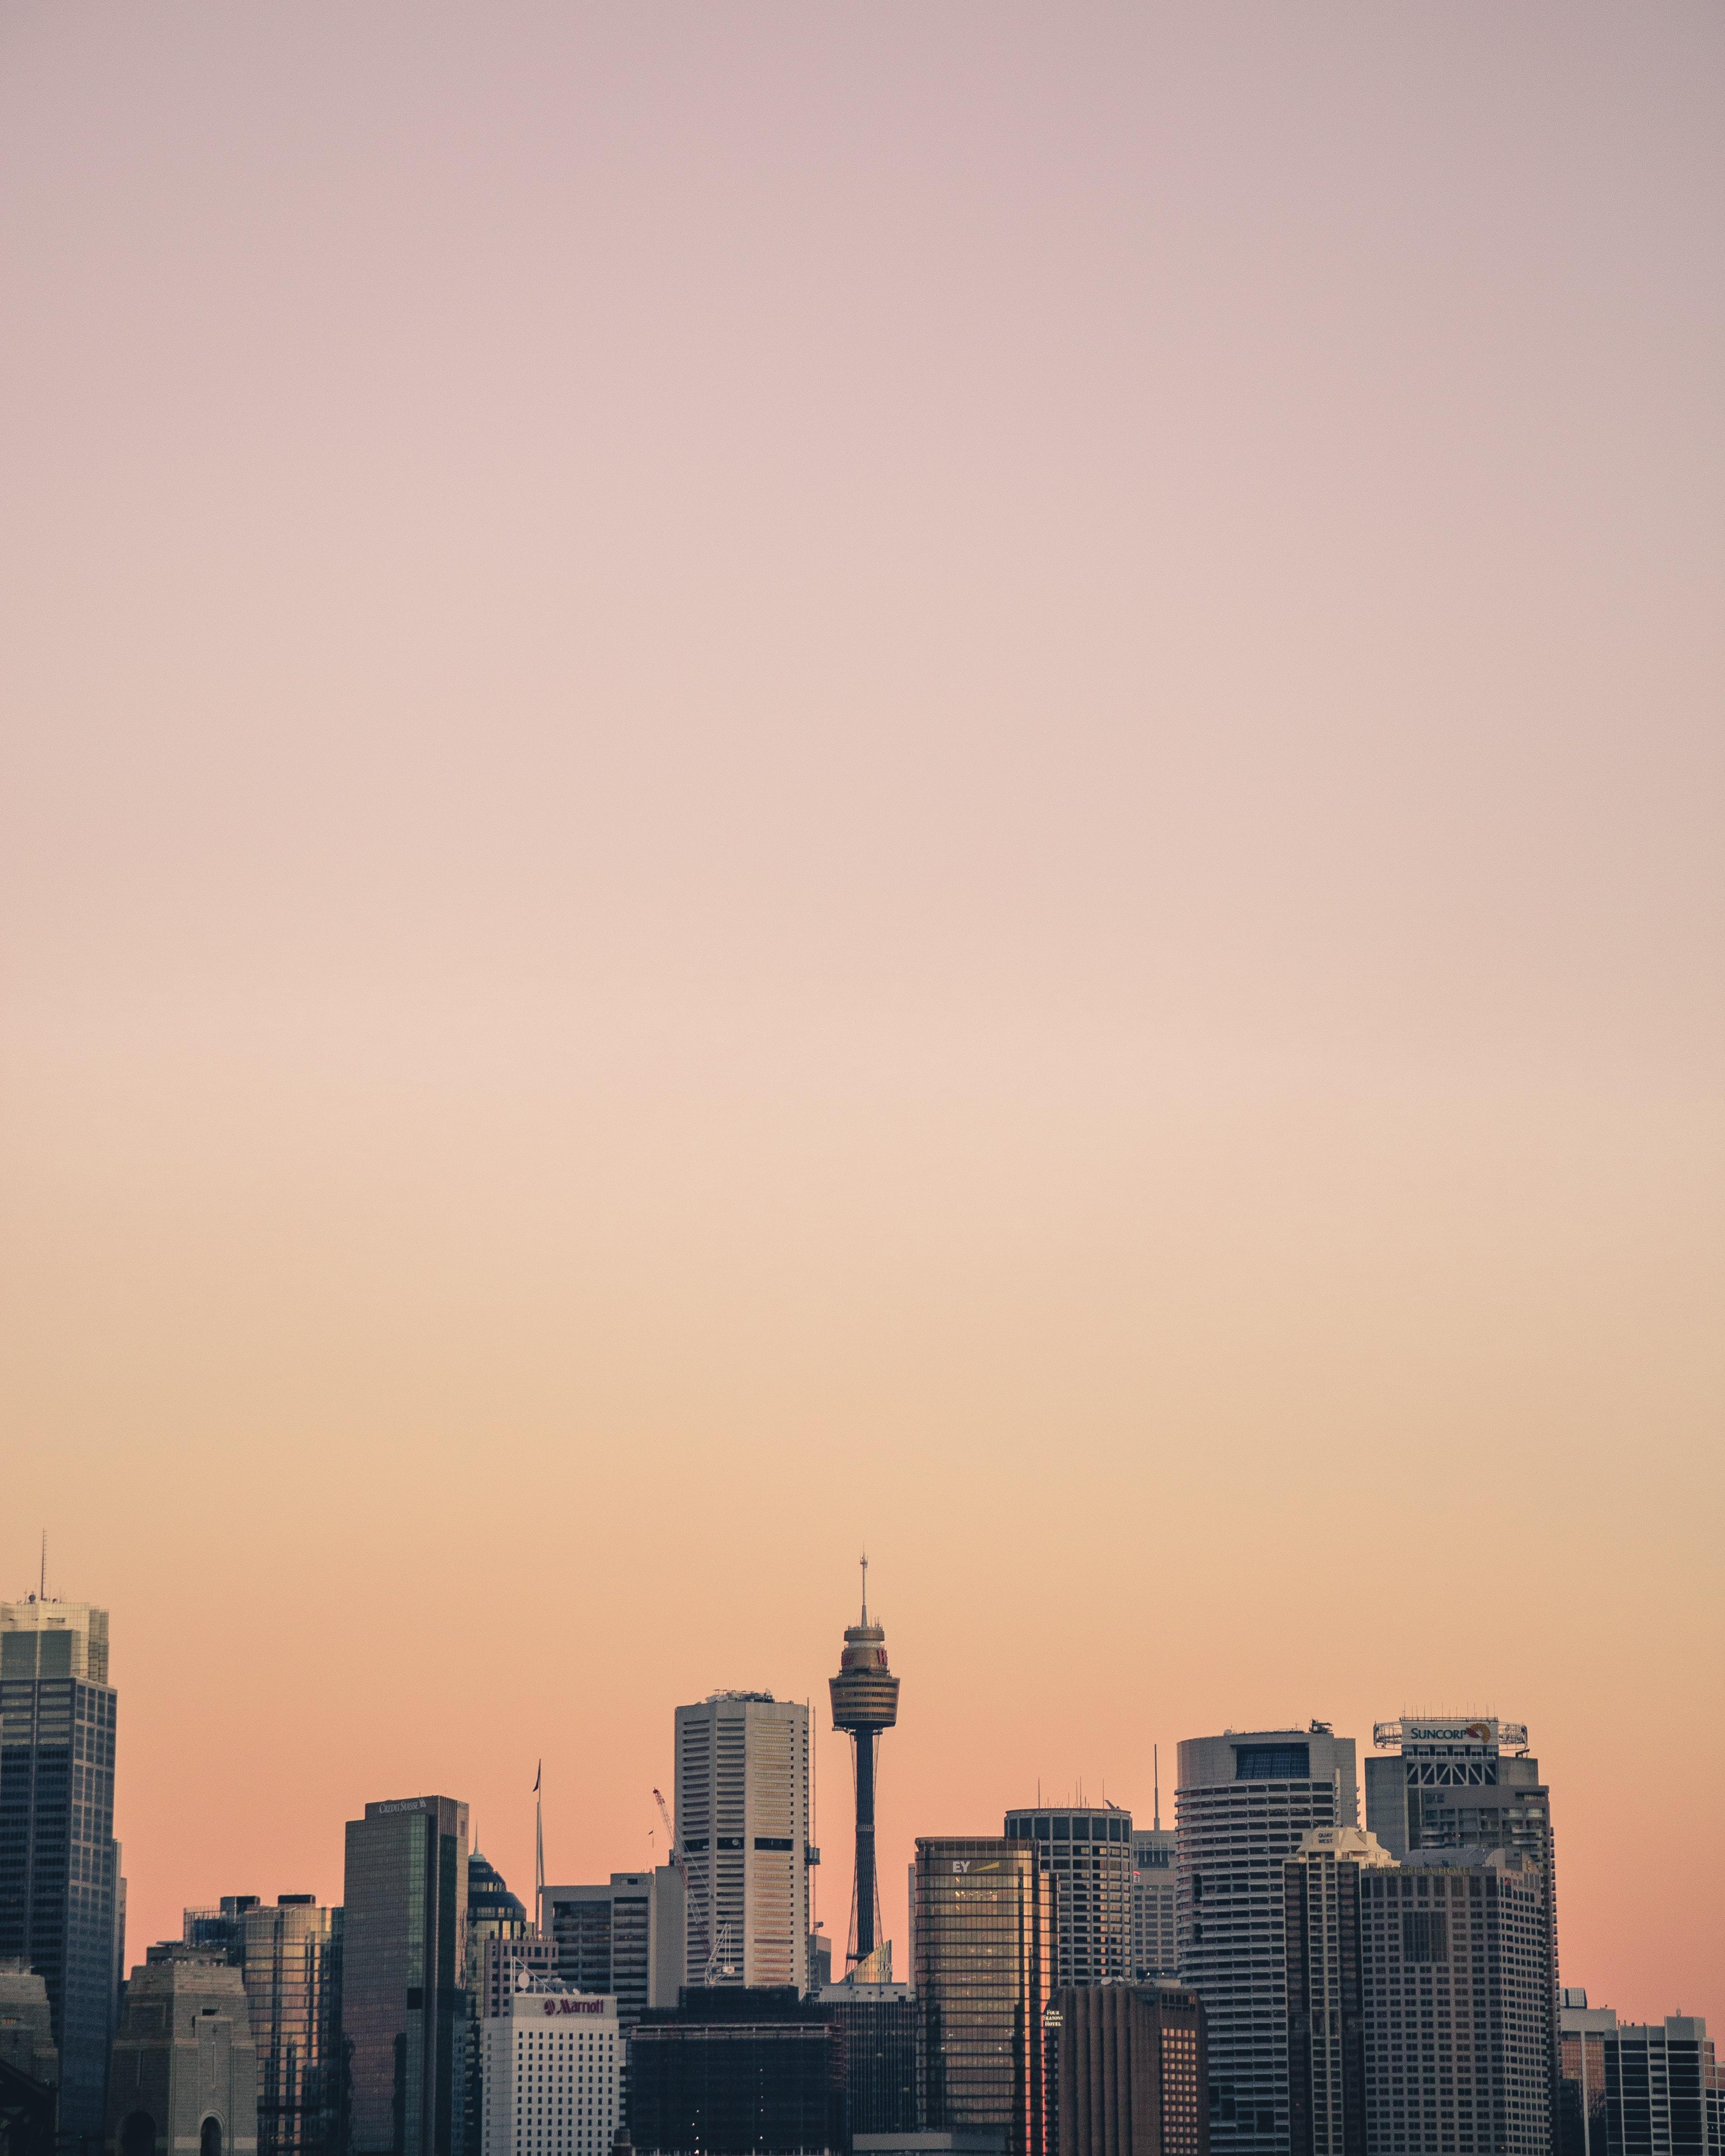 A dusky sky over the skyscrapers of Sydney